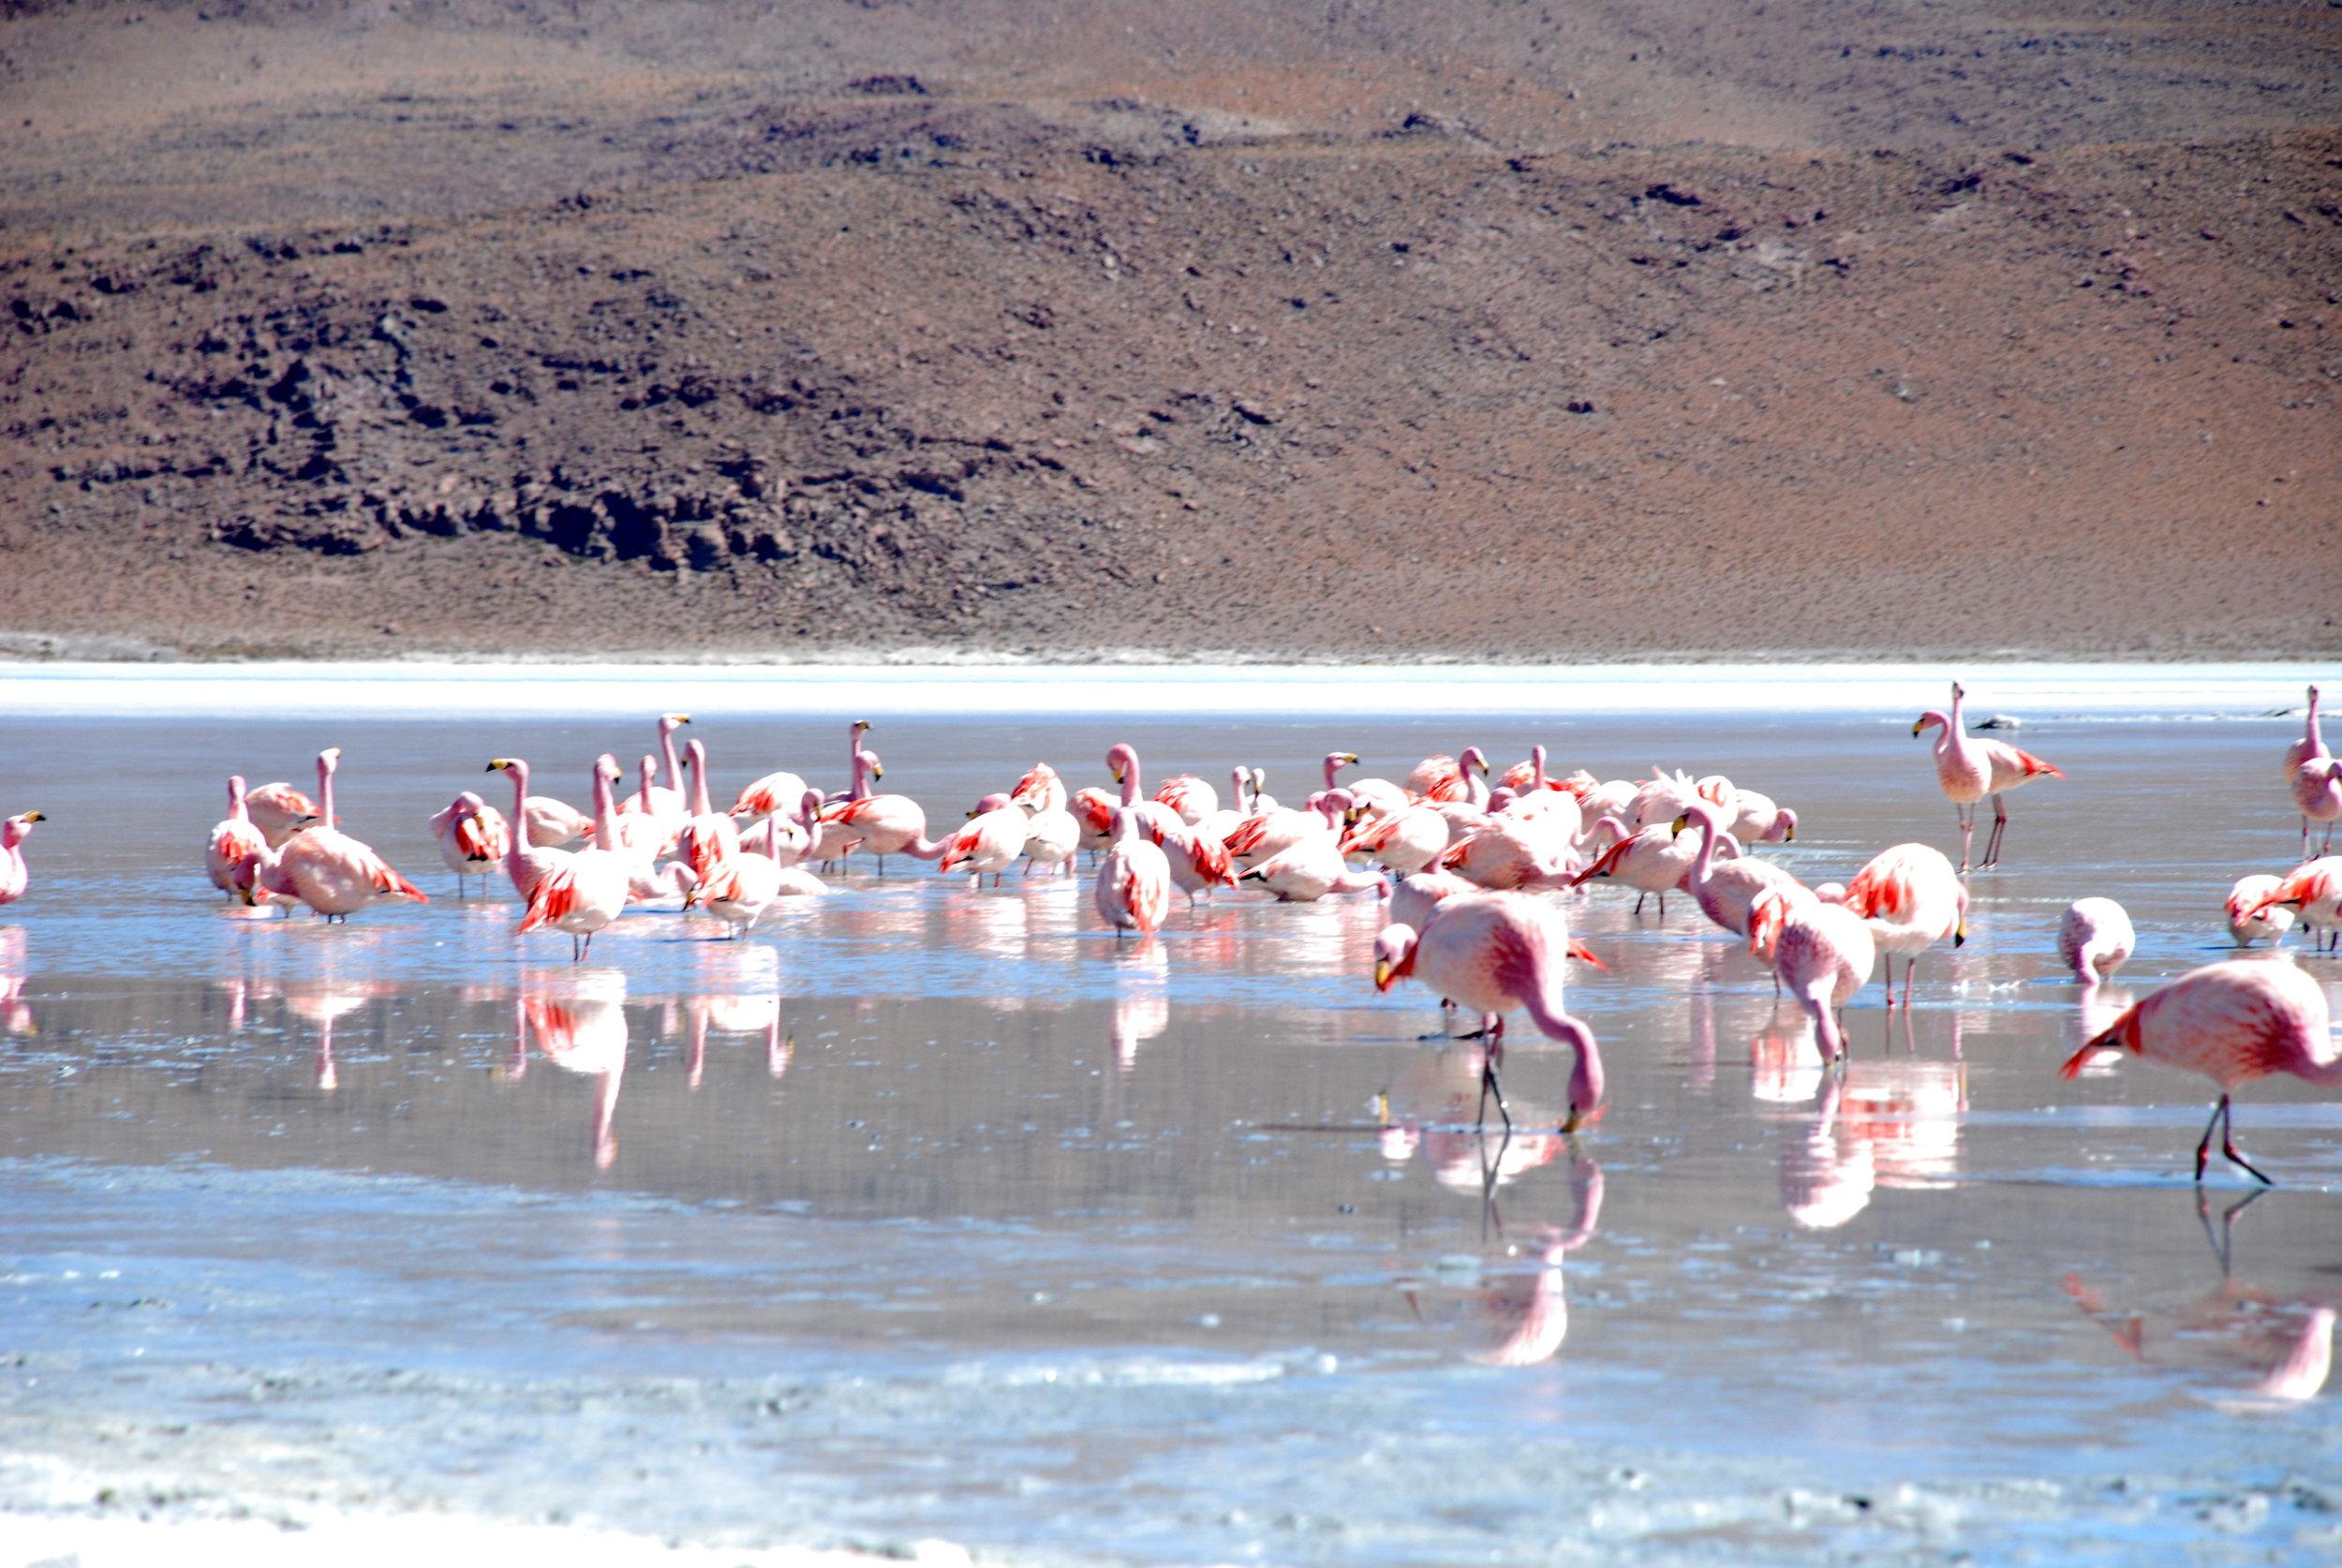 Flamingos in the Great Rann